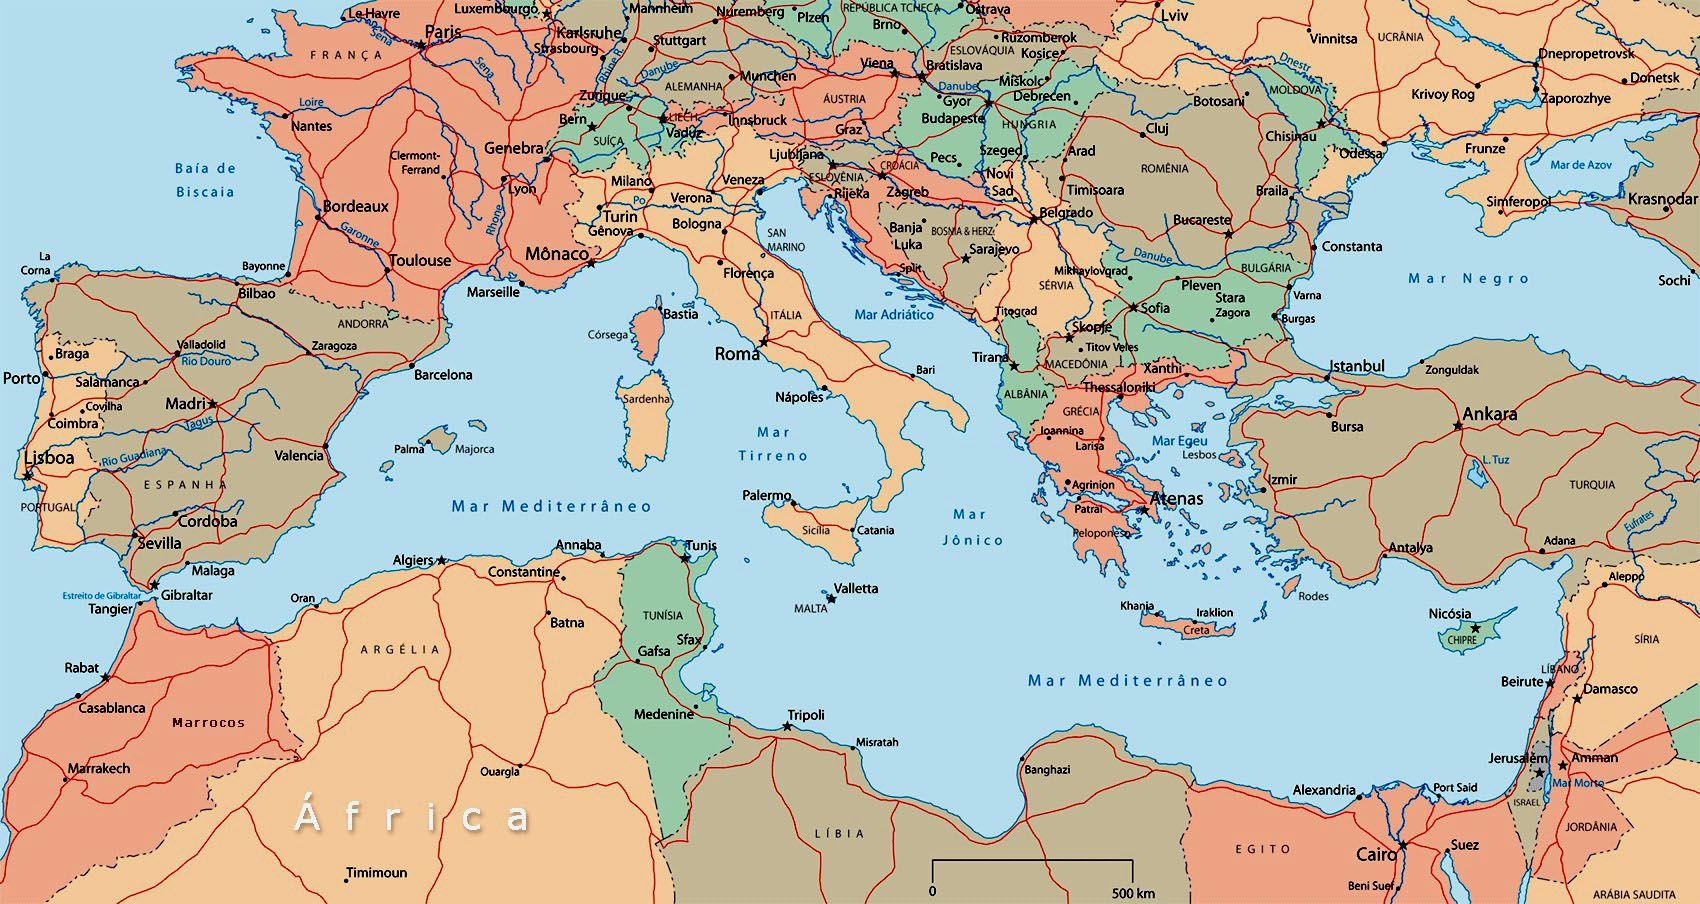 Mapa Del Mar Mediterraneo.Mapa Del Mediterraneo En 2019 Mapa Del Mediterraneo Mapa